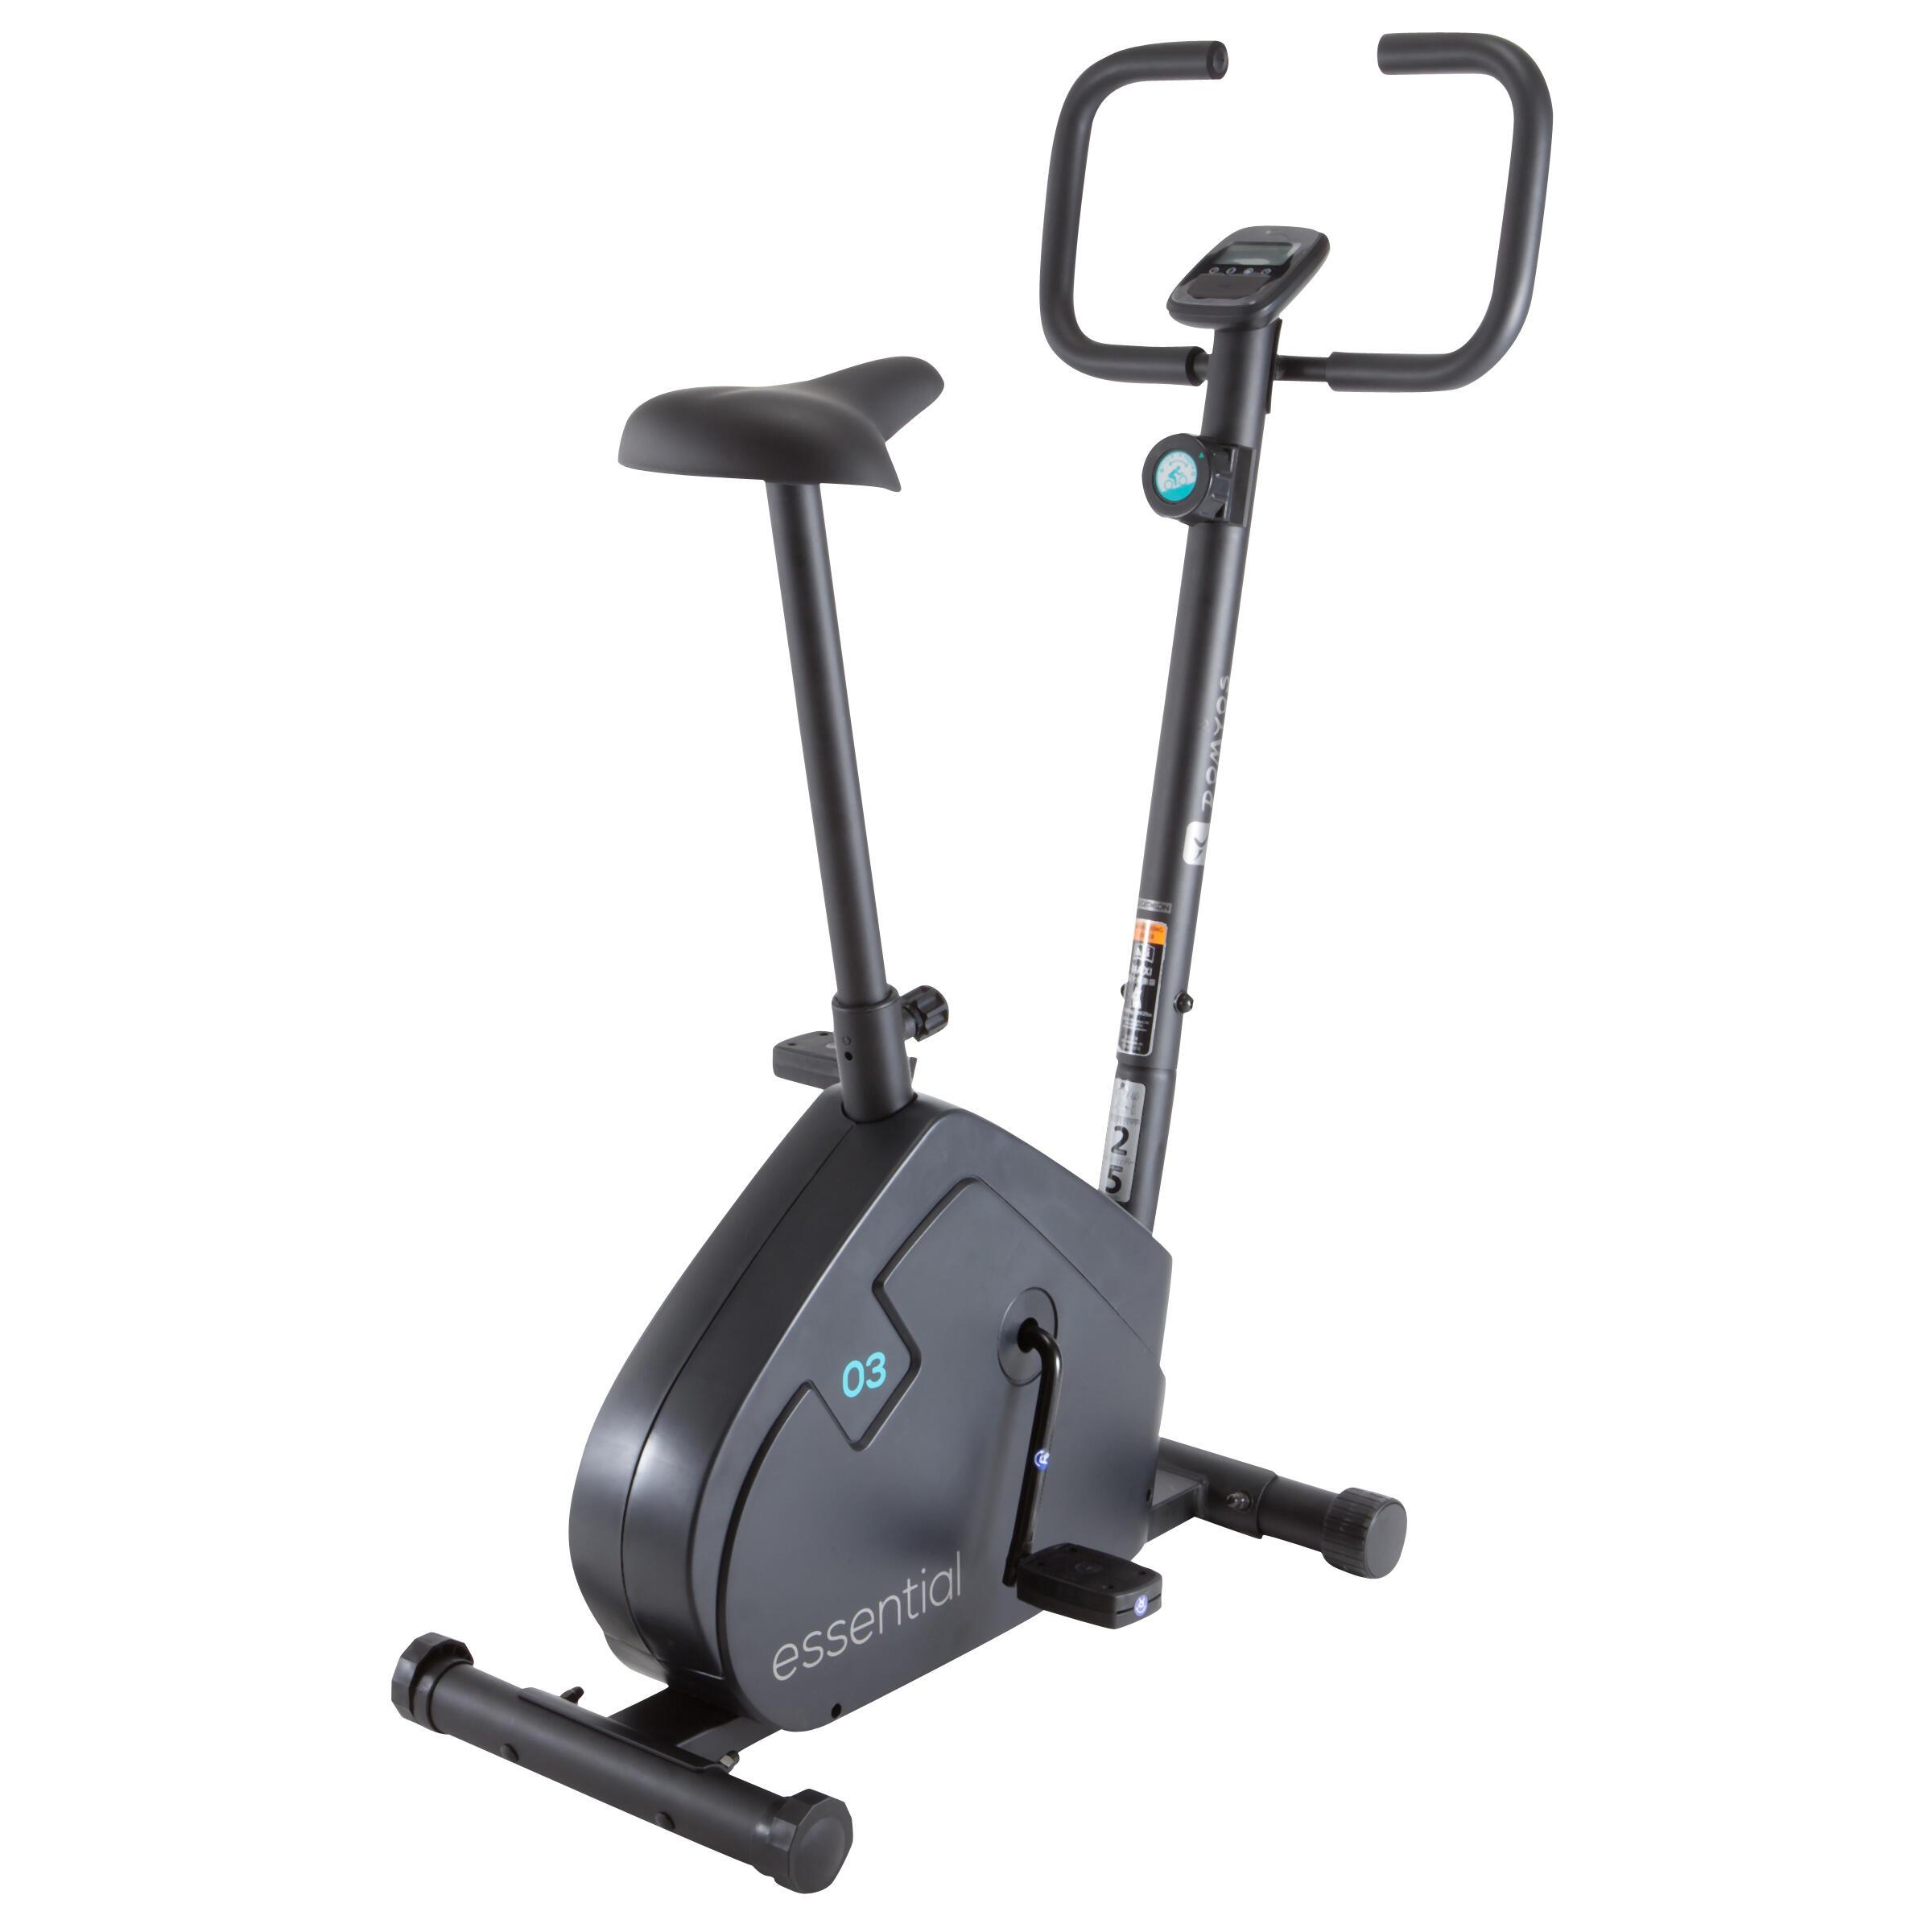 Domyos Hometrainer Essential